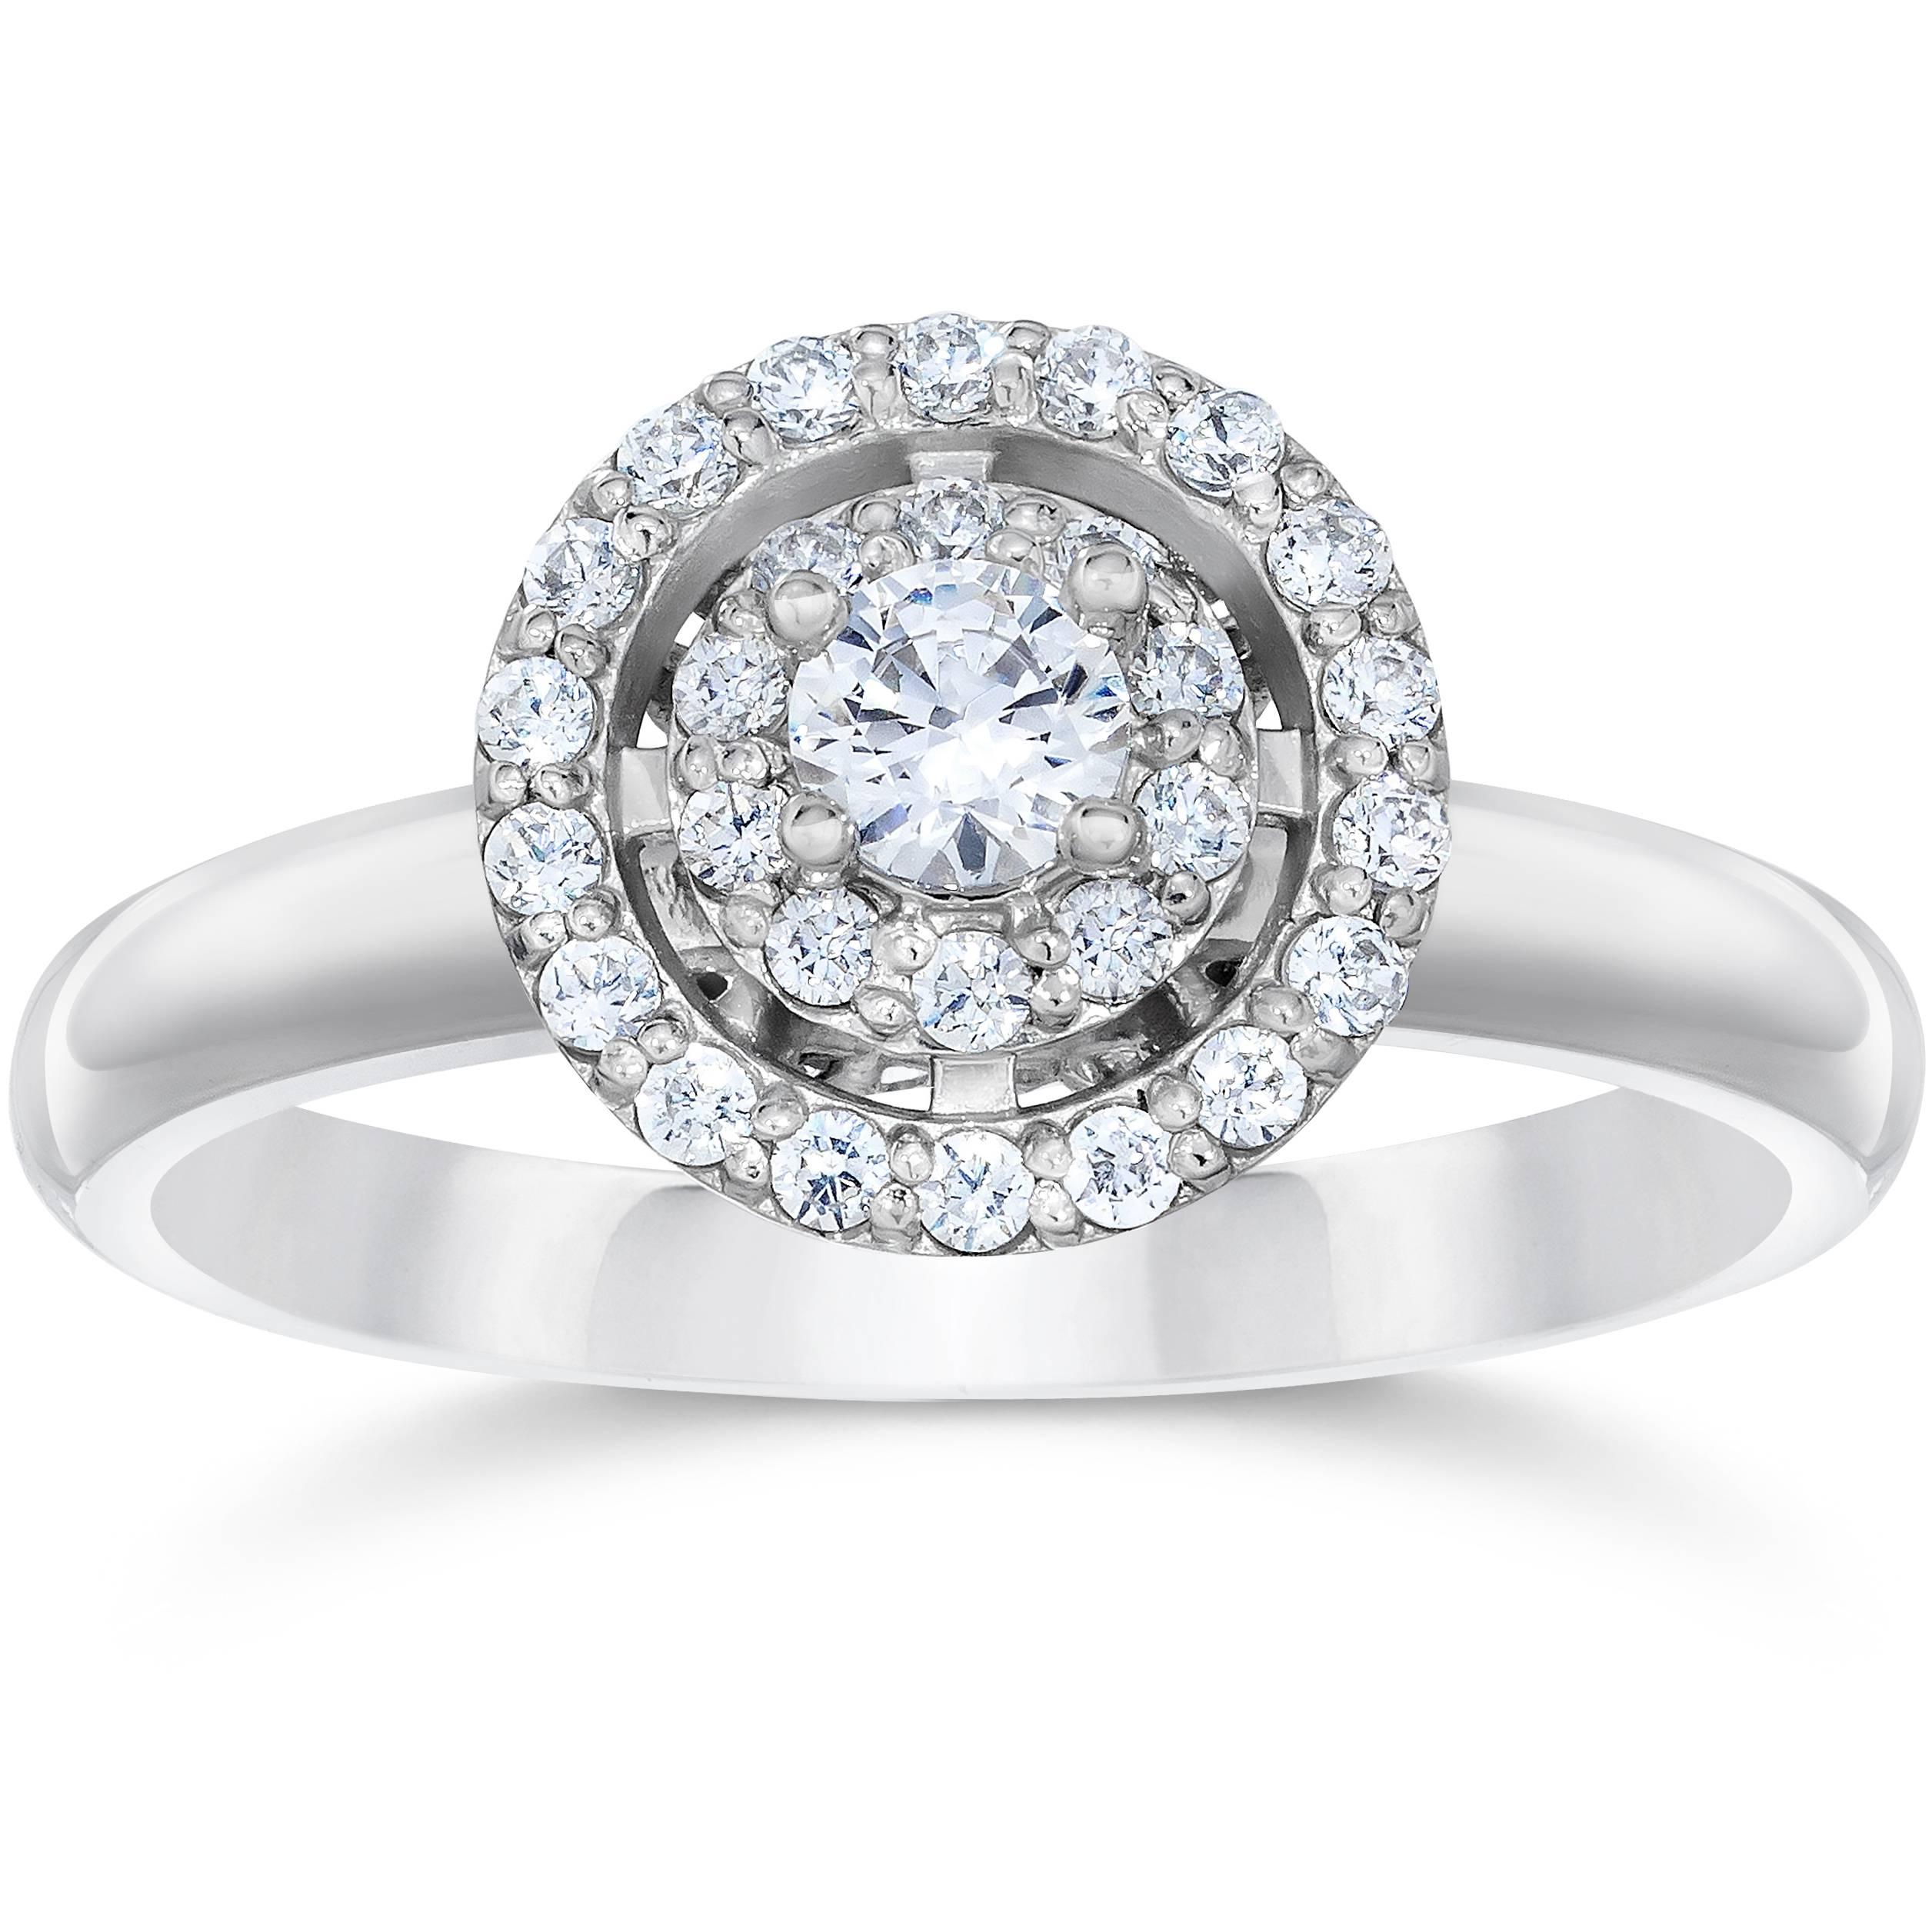 Vintage Double Halo Diamond Engagement Ring 58 Carat 14k. Real Emerald Bracelet. Senior Rings. Bridesmaid Bracelet. Compass Pendant. Old School Wedding Rings. Door Rings. Acquamarine Pendant. Sisterhood Bracelet